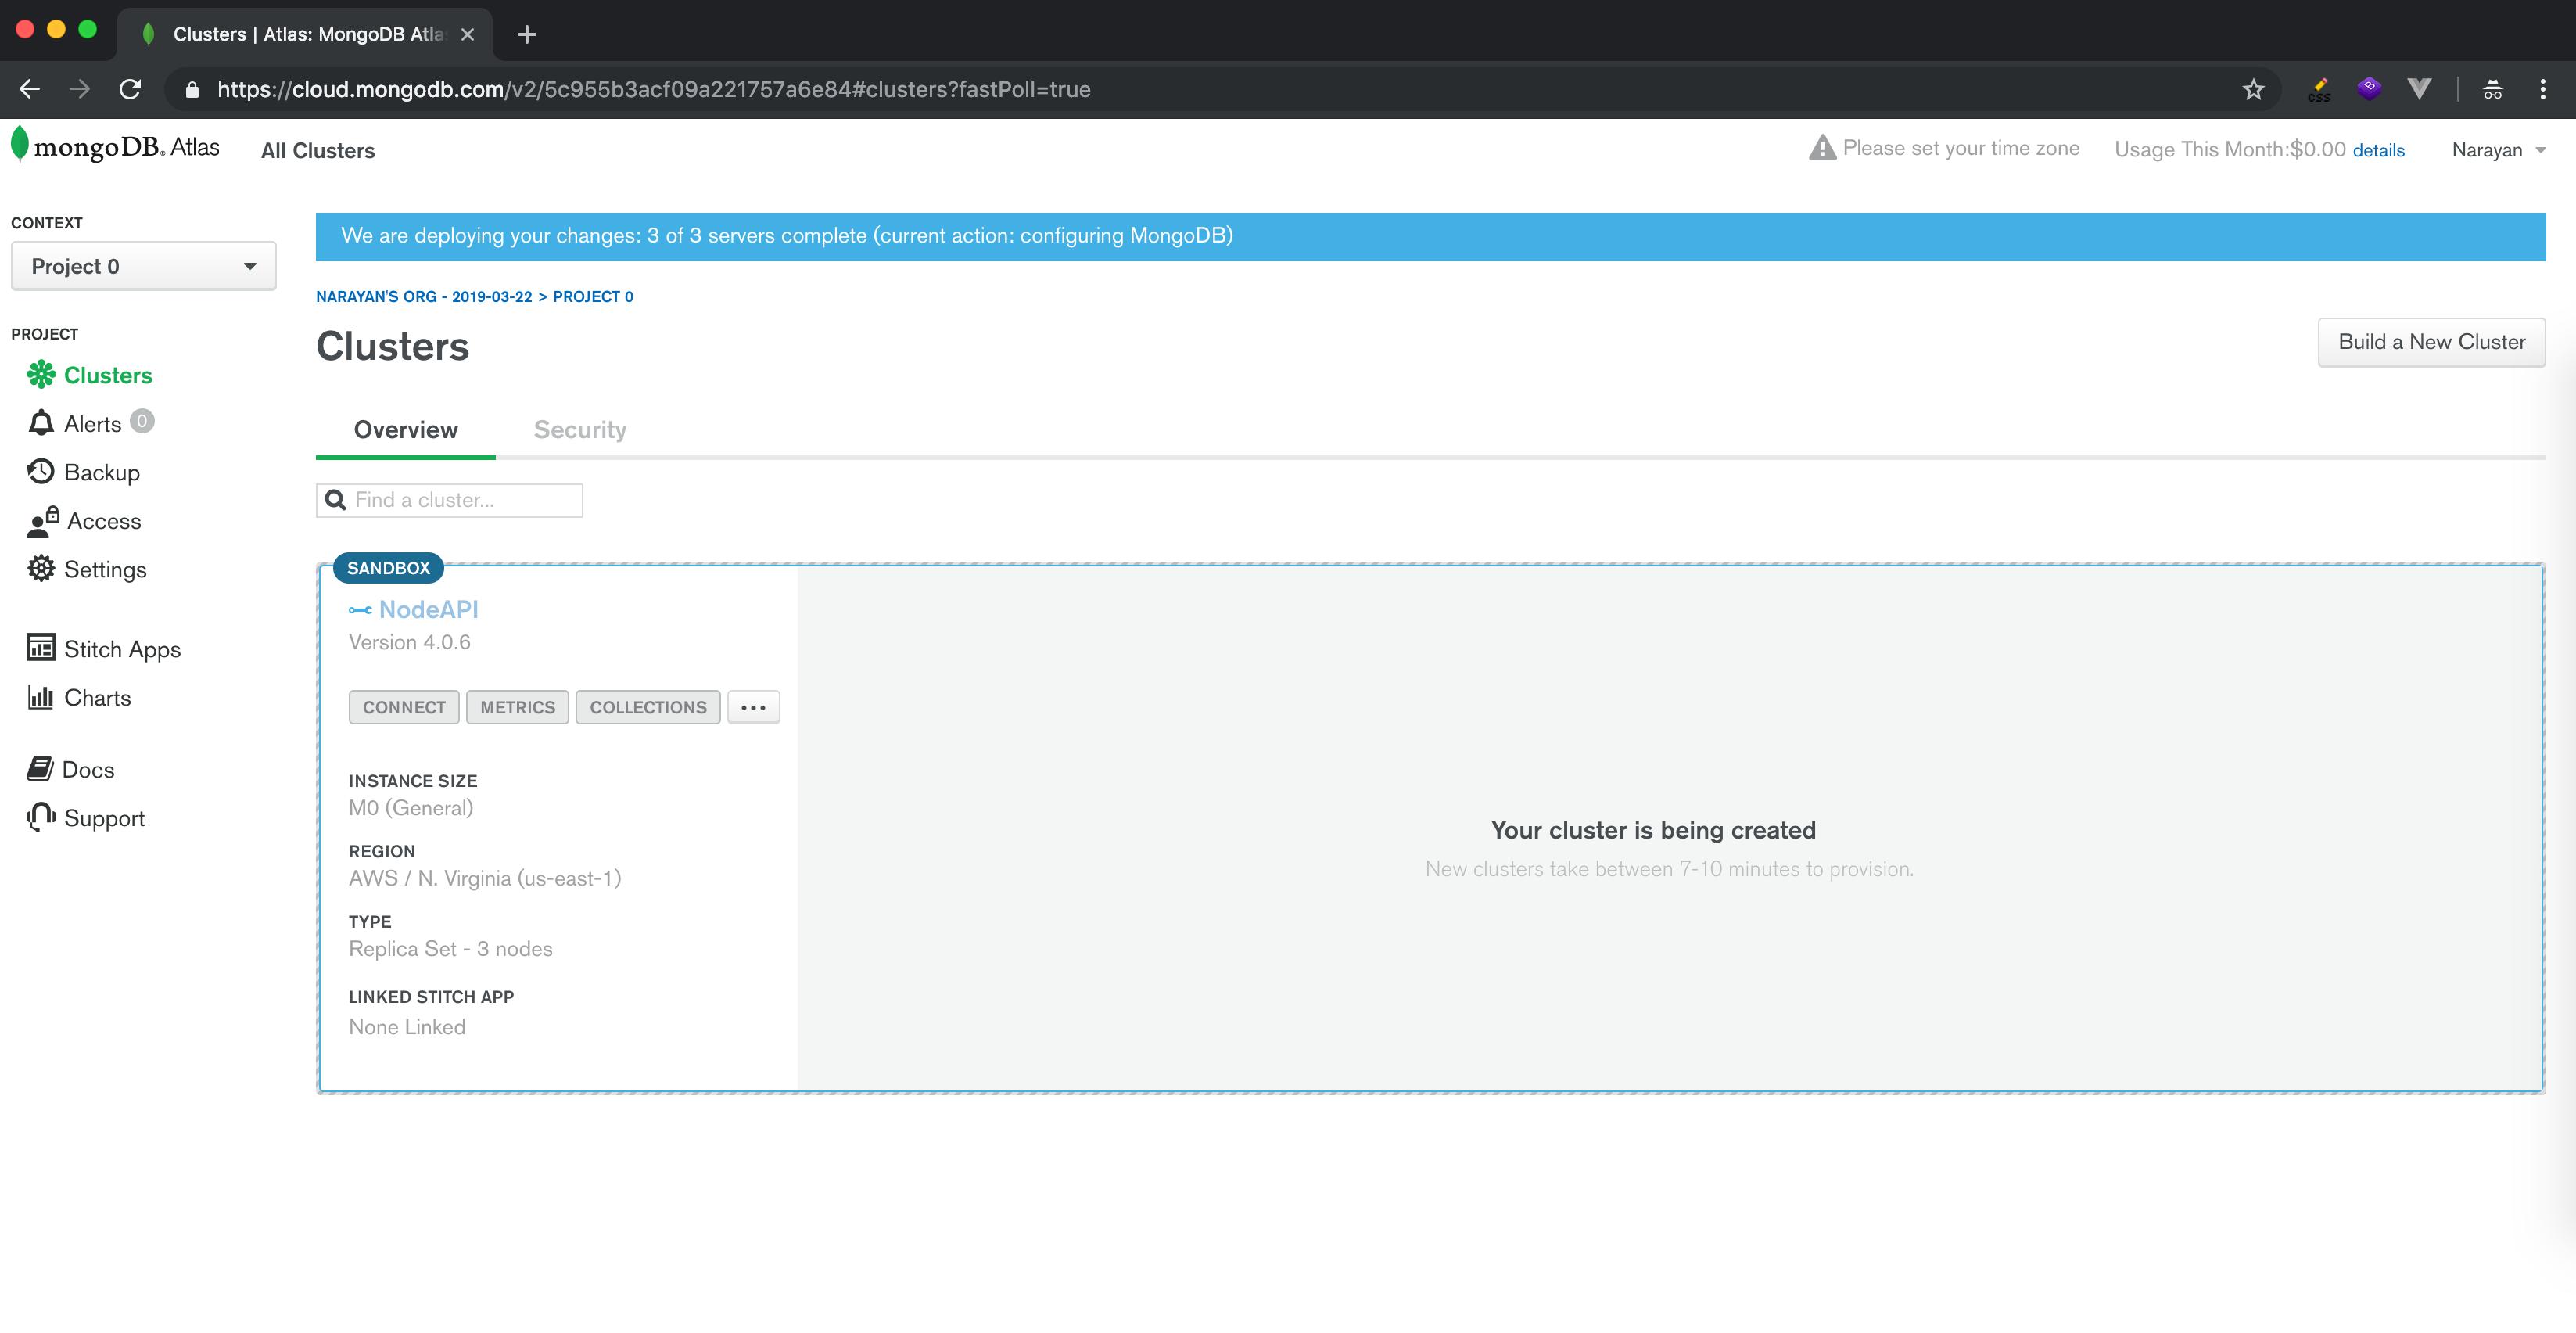 Kaloraat - How to use MongoDB Atlas?